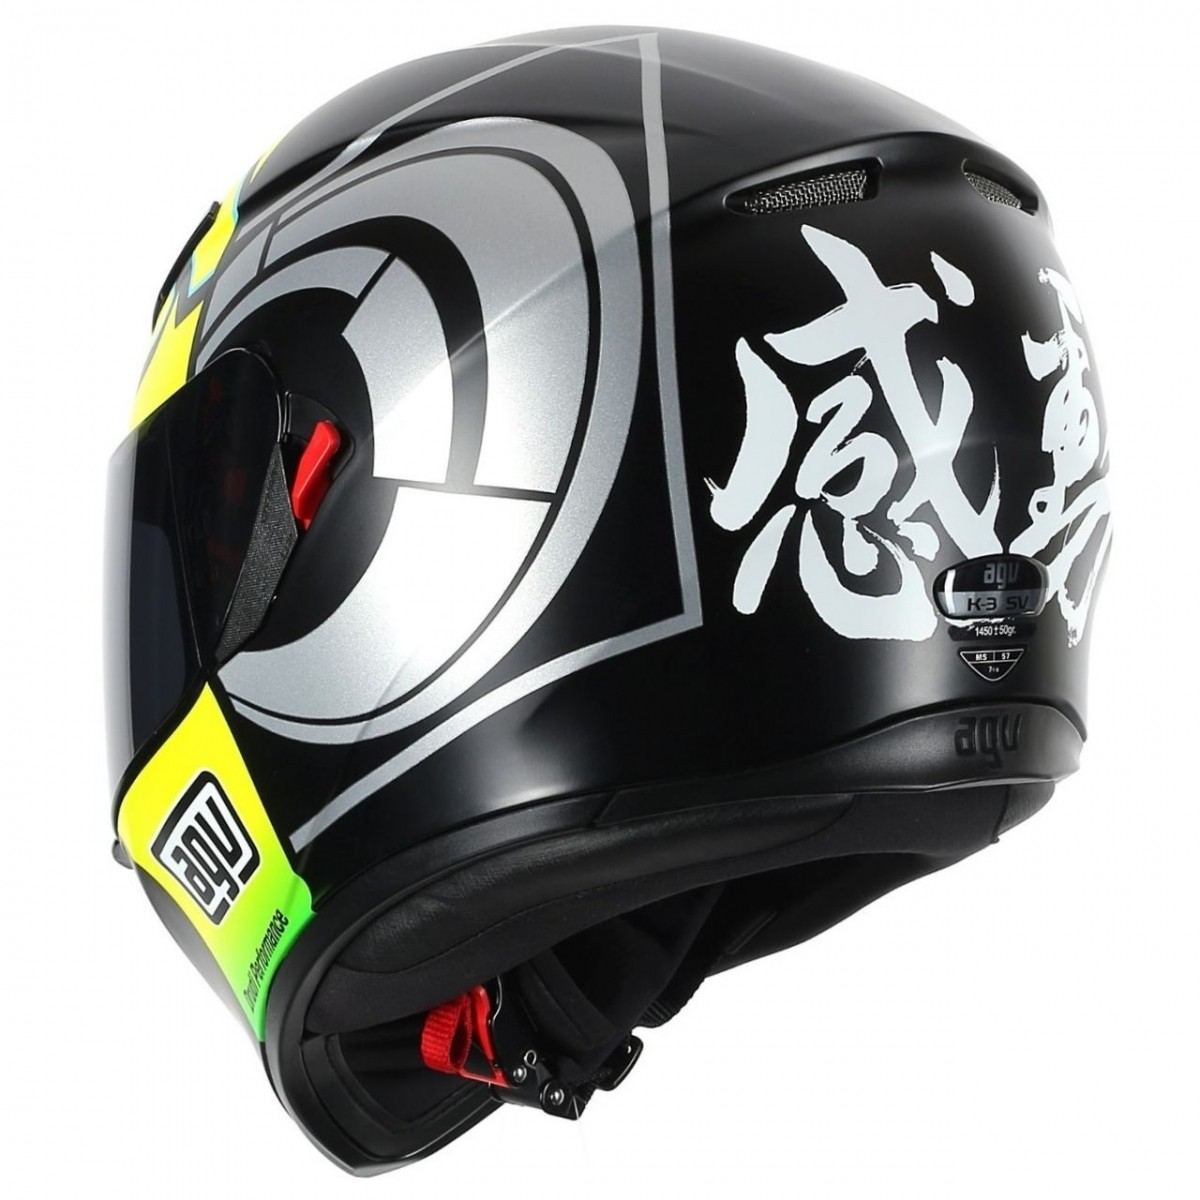 Capacete AGV K3 SV Winter Test 12 C/ Viseira Interna Solar - Réplica Oficial Valentino Rossi   - Planet Bike Shop Moto Acessórios